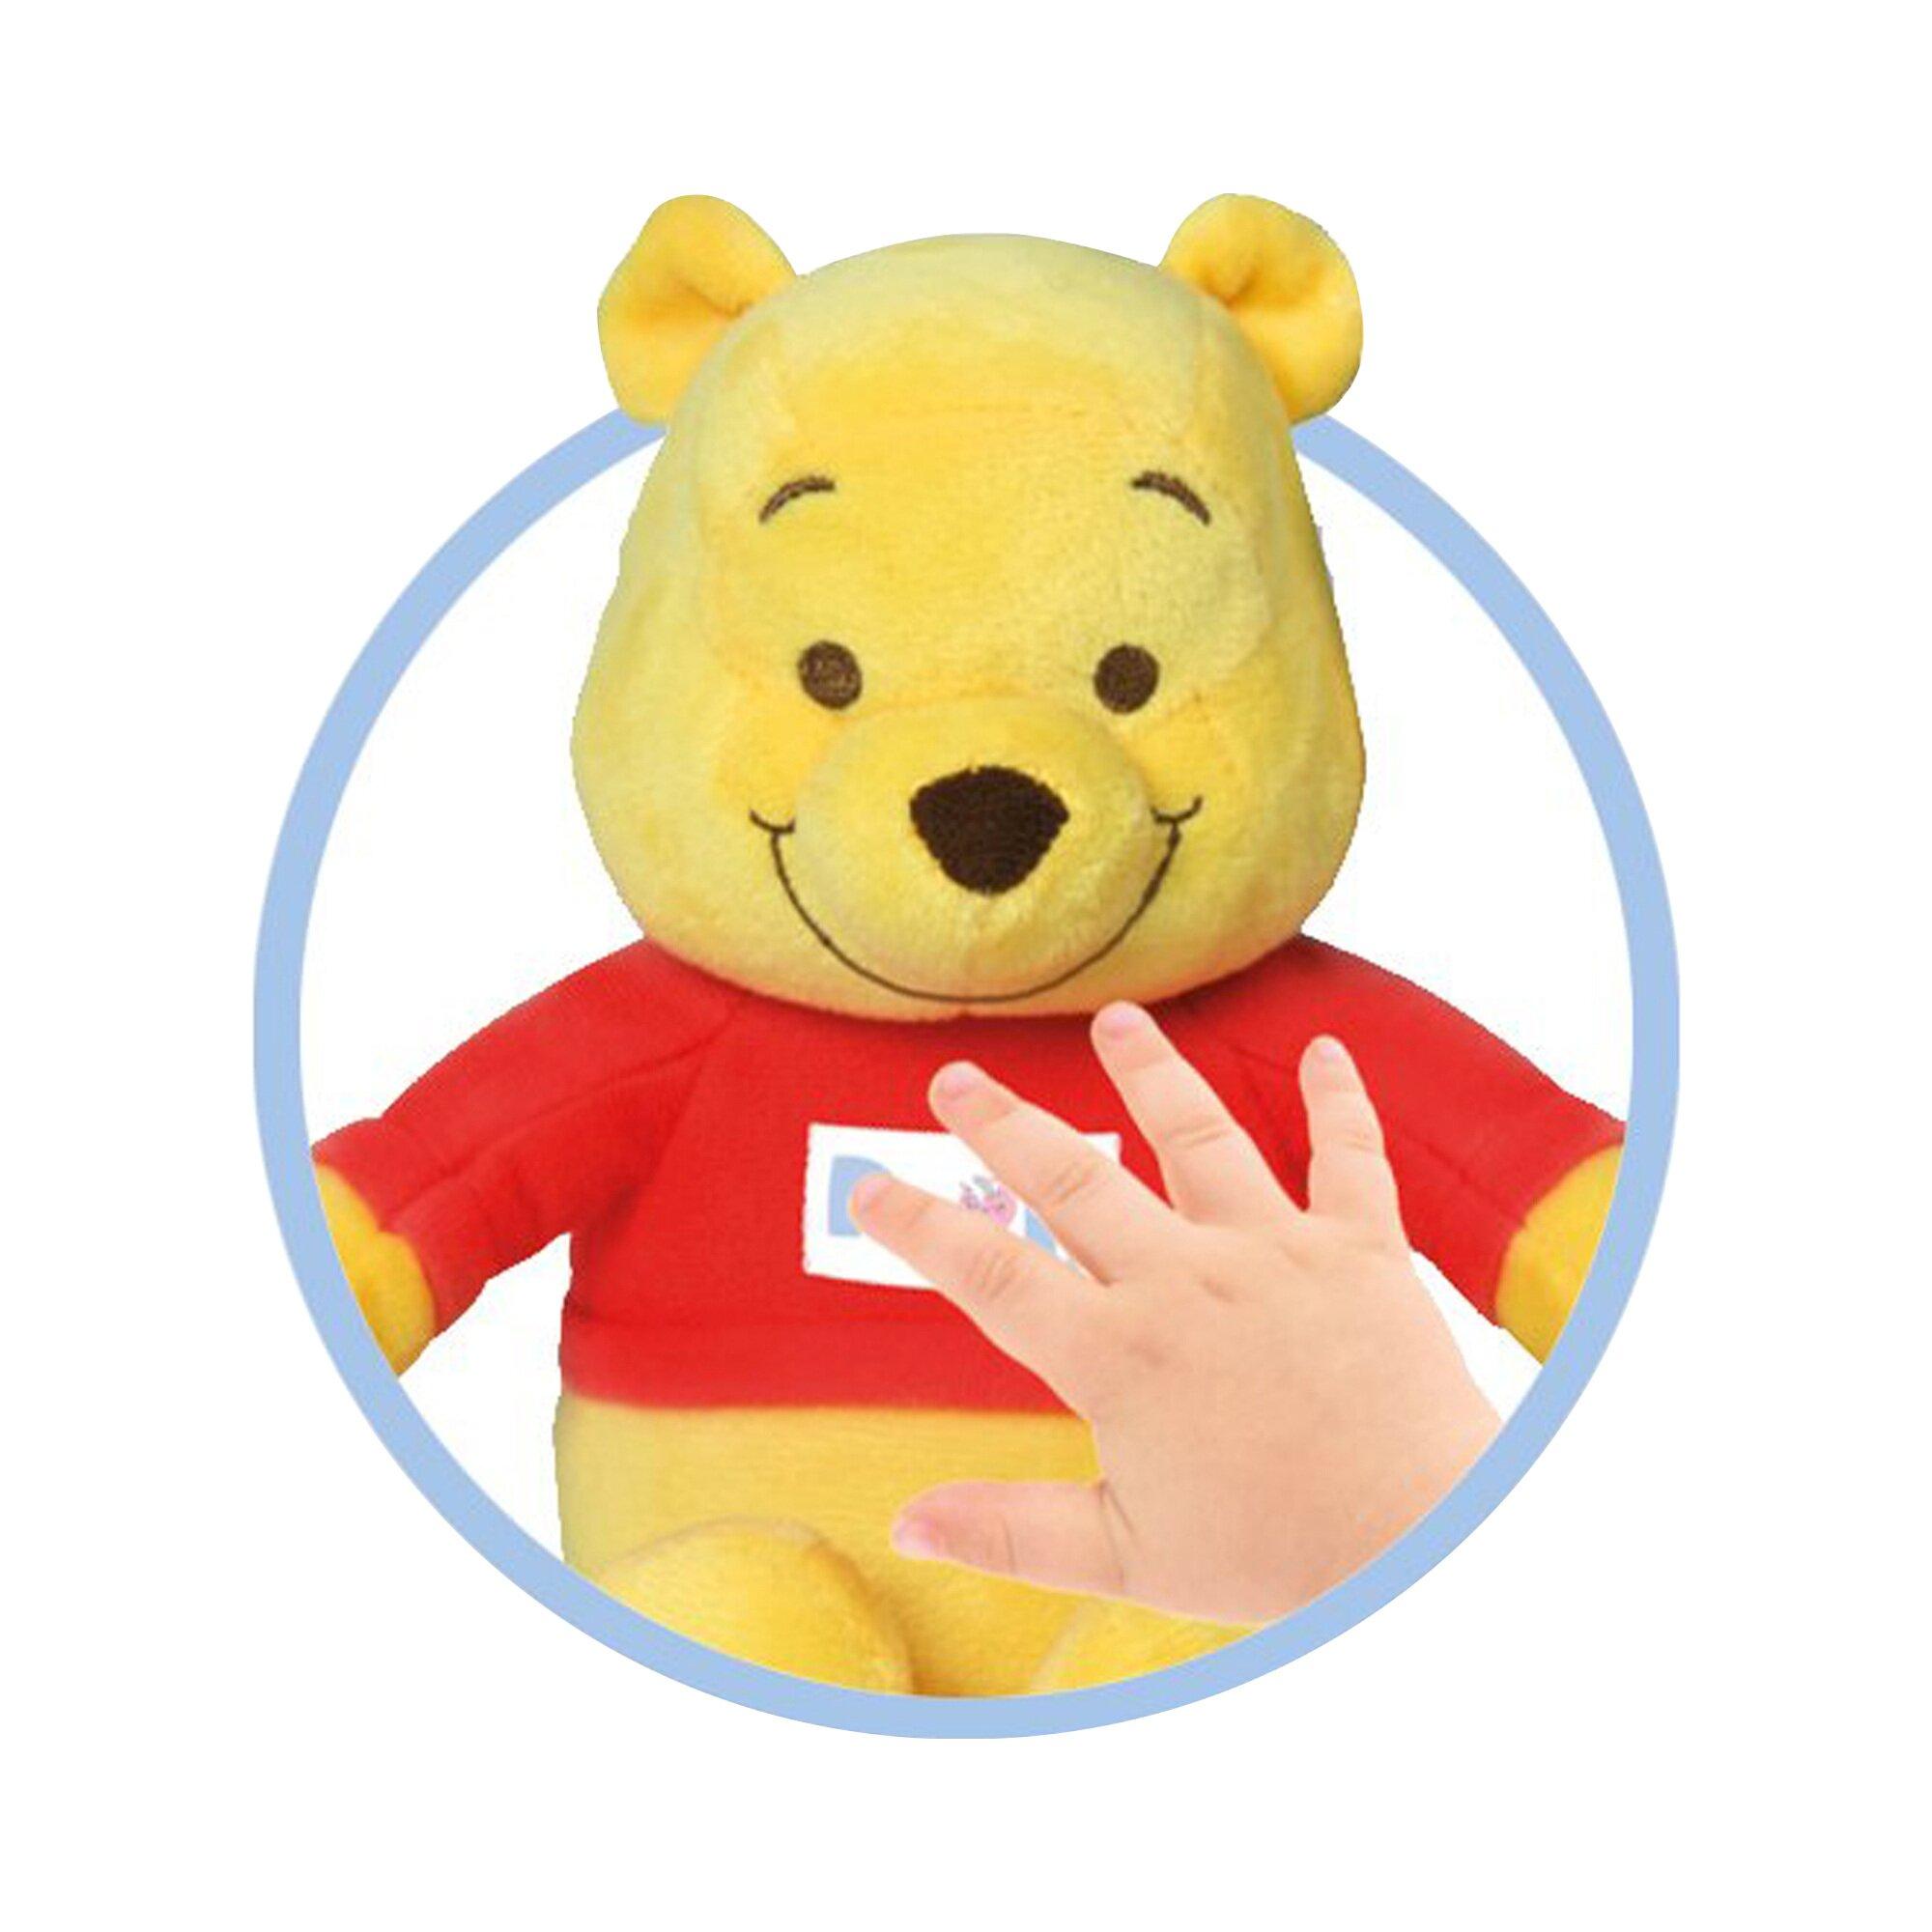 disney-baby-stoffspielzeug-winnie-the-pooh-aktivitats-plusch